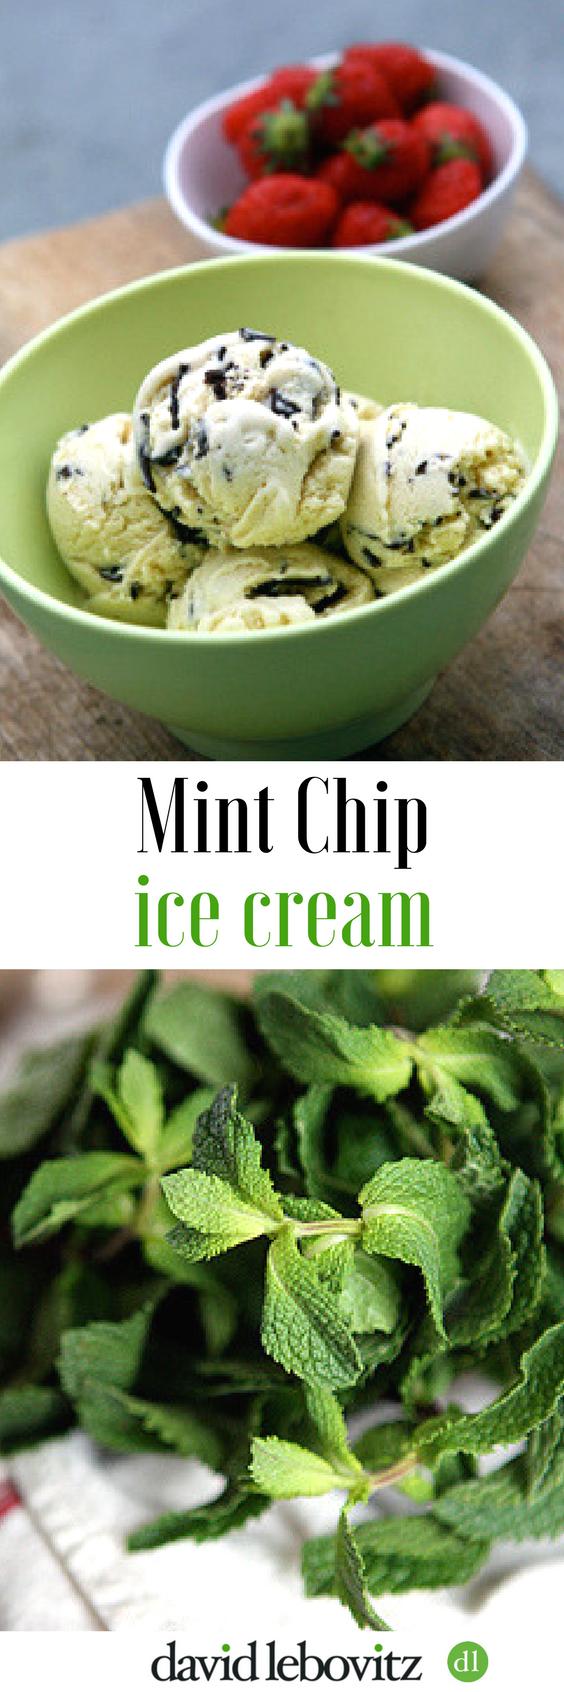 Homemade fresh mint ice cream with chocolate chips